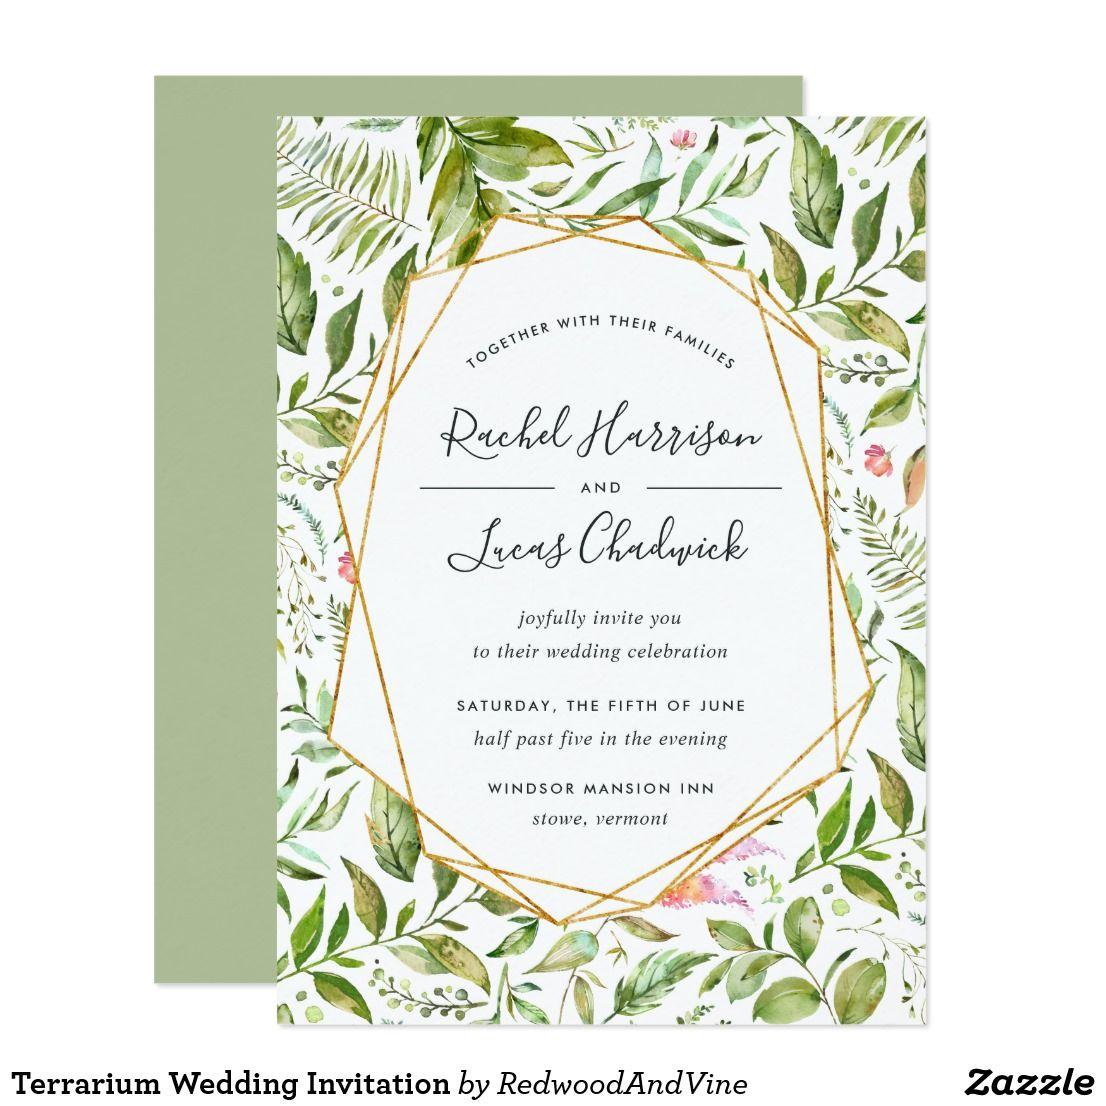 Terrarium Wedding Invitation | Invites wedding, Wedding and Wedding